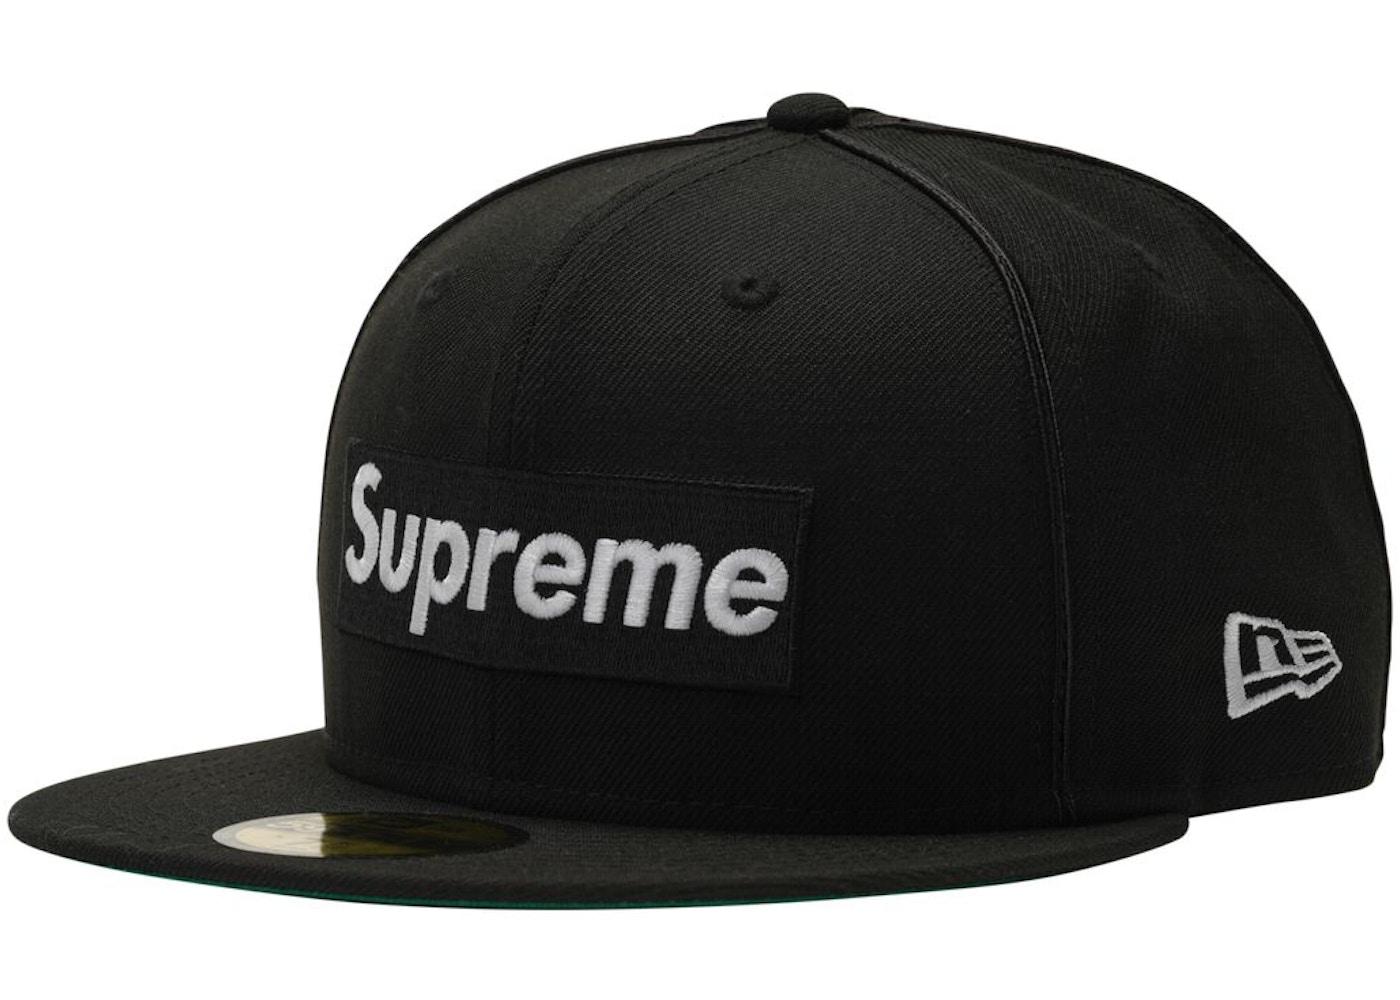 b8f7389a Streetwear - Supreme Headwear - Average Sale Price